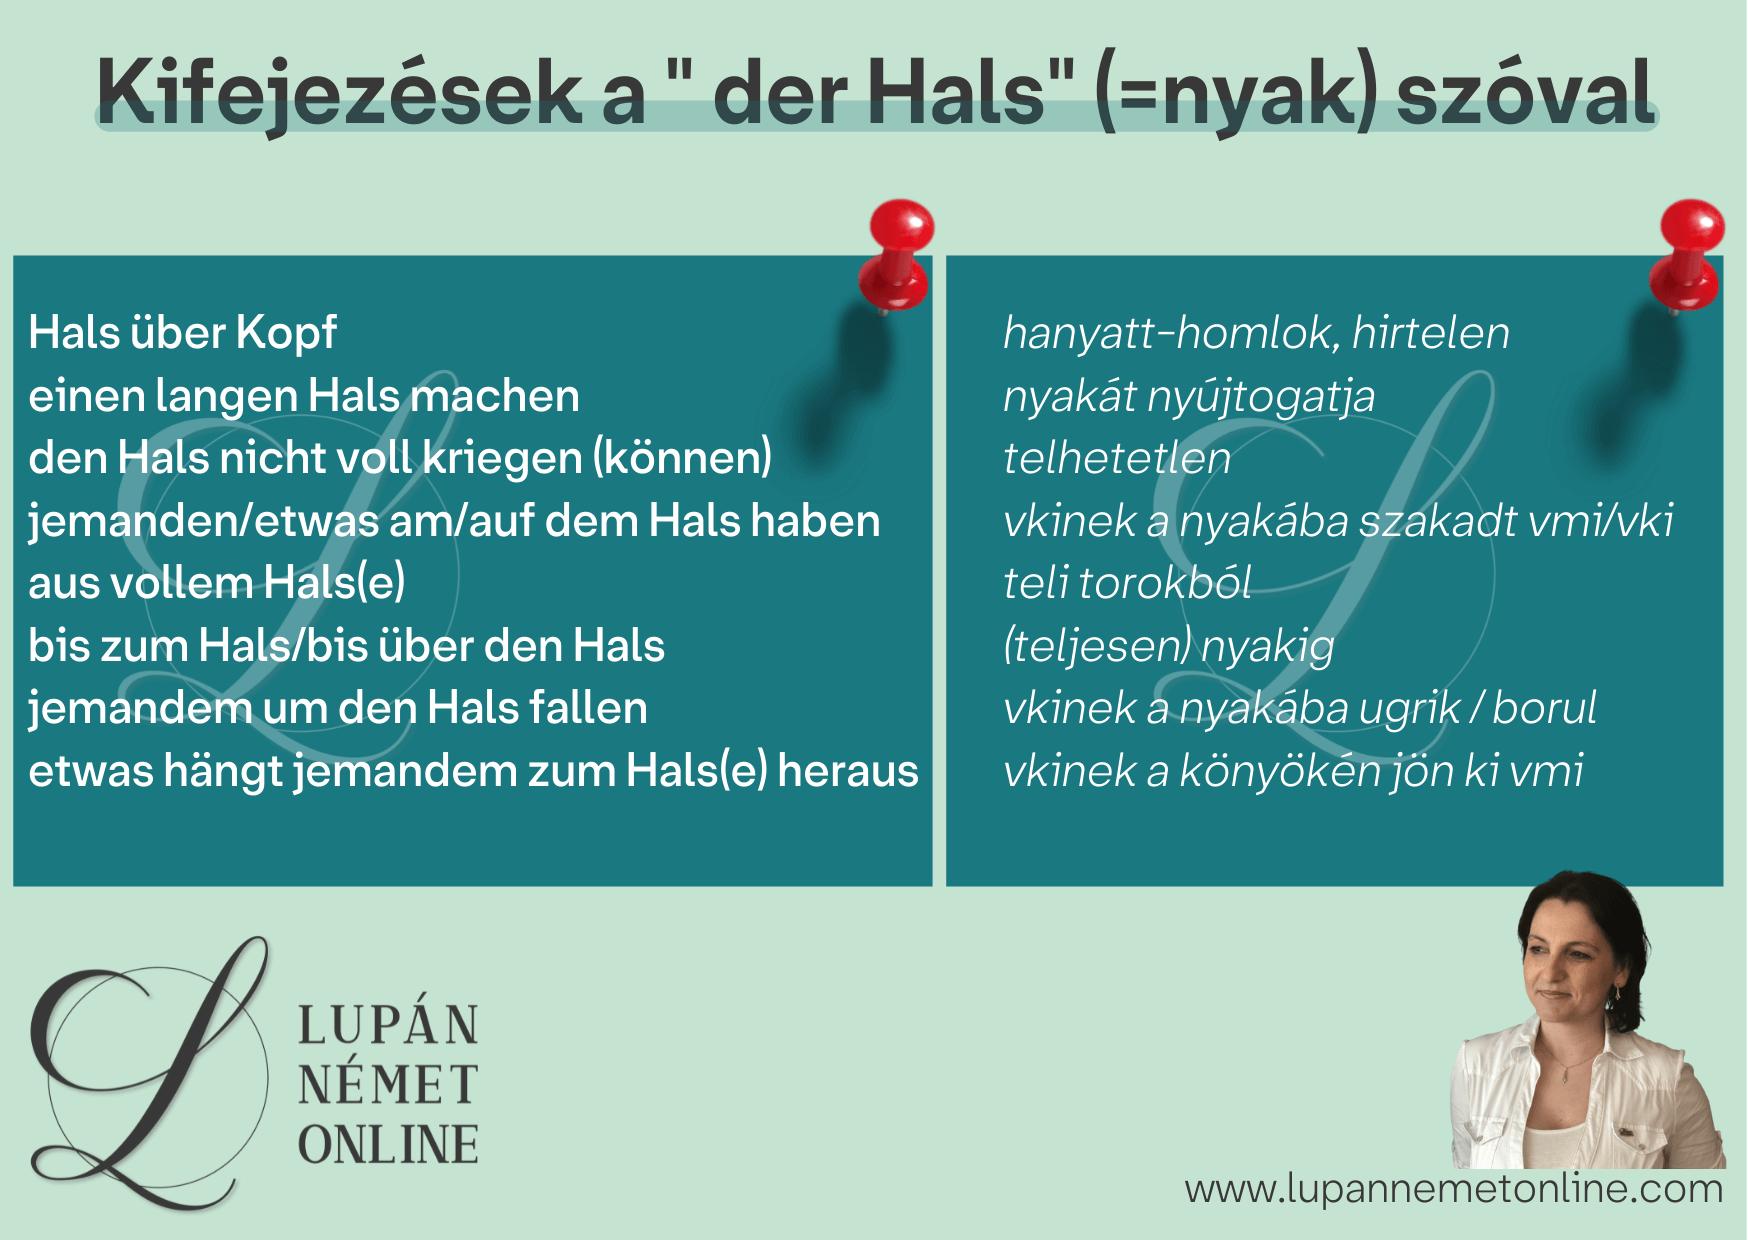 kifejezesek_hals